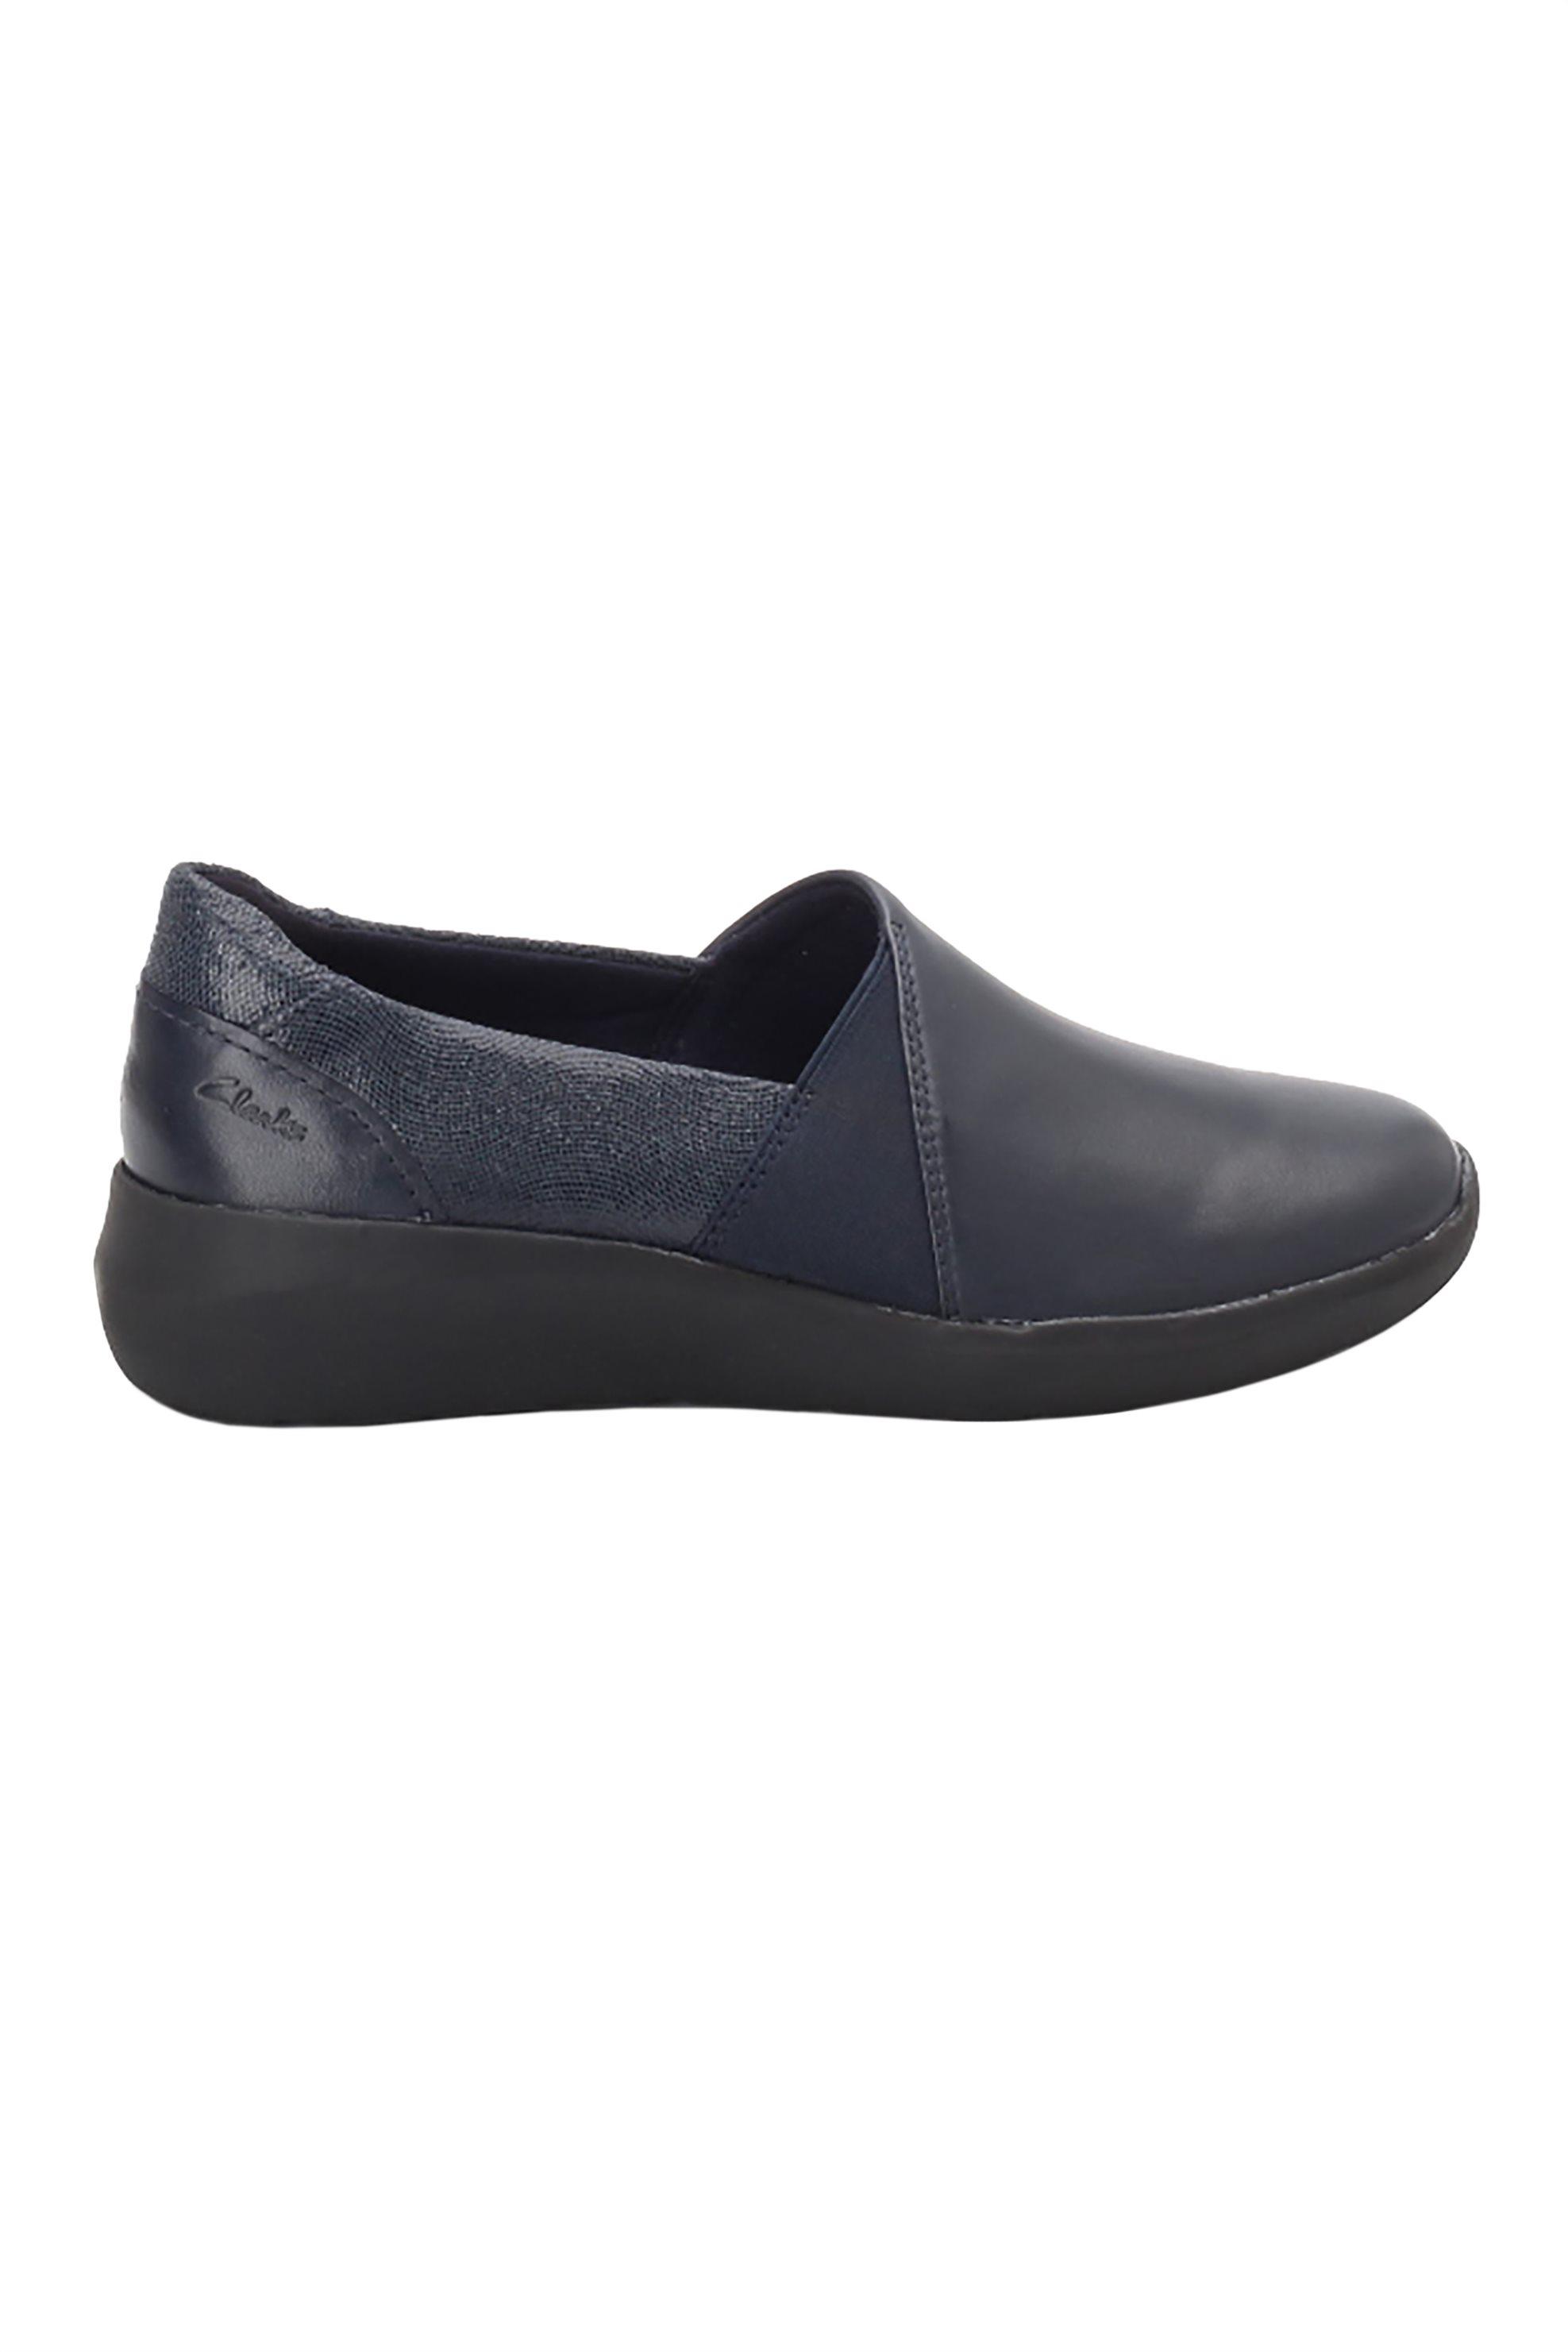 "Clarks γυναικεία loafers με μεταλλιζέ λεπτομέρεια ""Kayleigh Step"" – 26153202 – Μπλε Σκούρο"